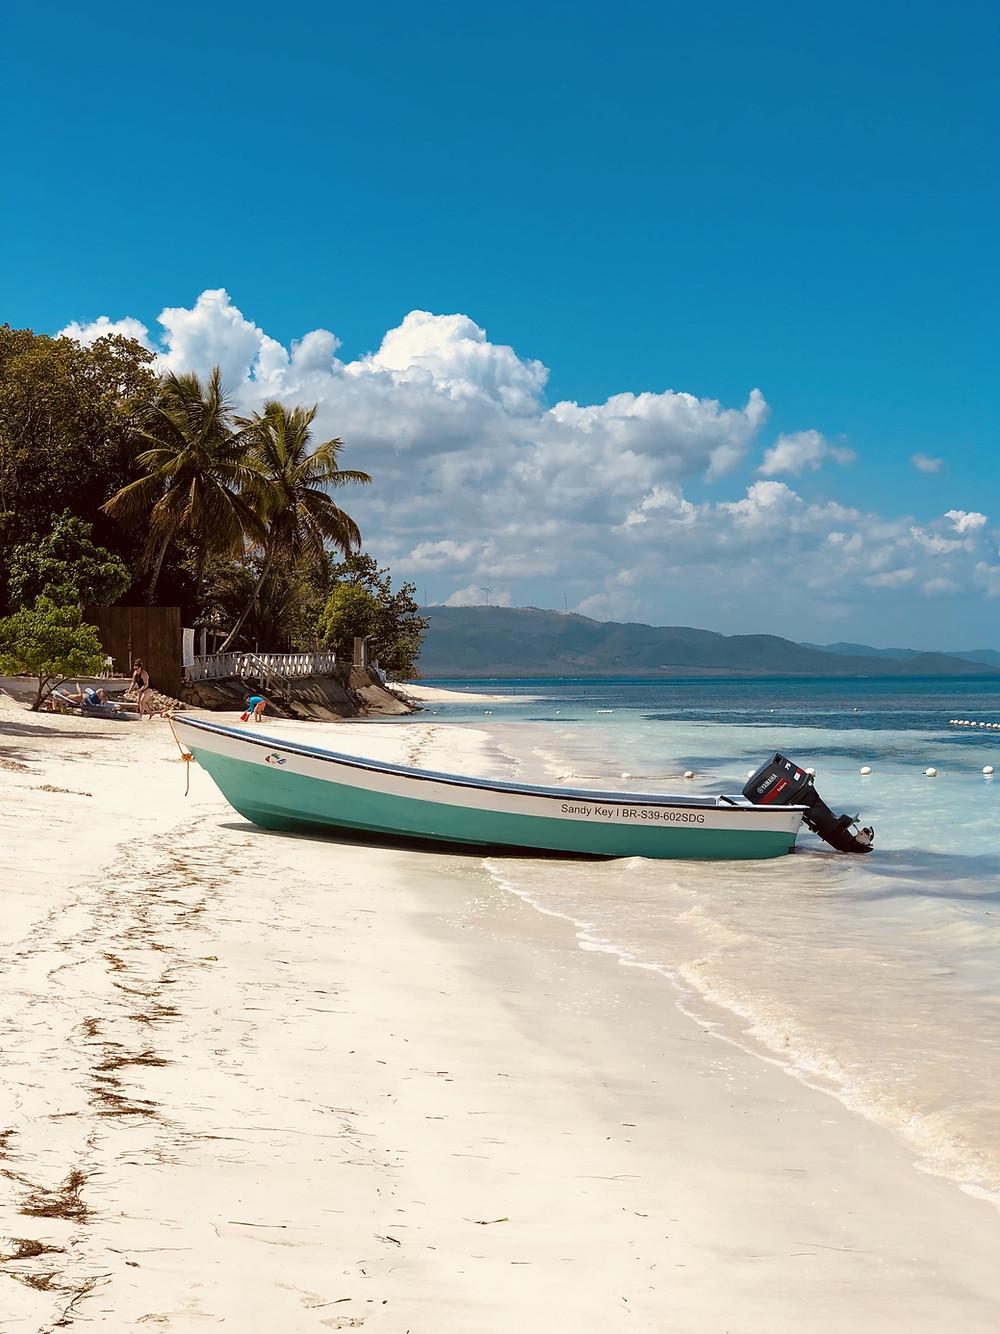 Departure beach Paradise Island @Punta Rucia